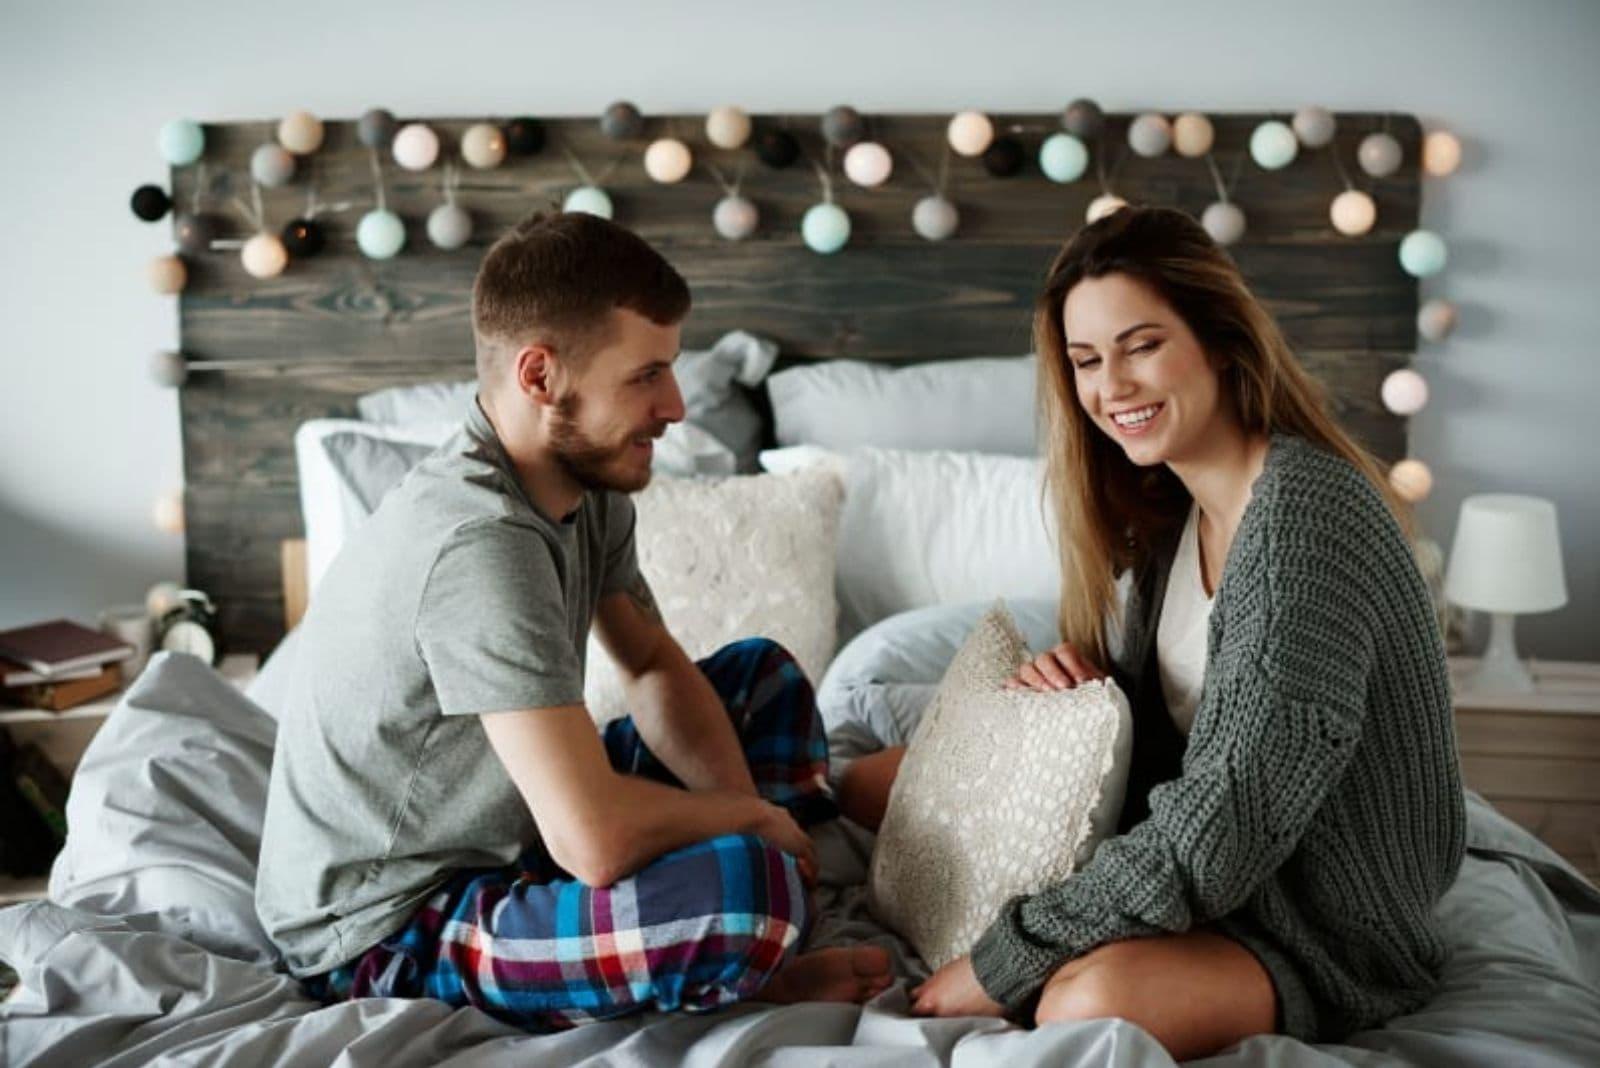 couple having fun in bedroom